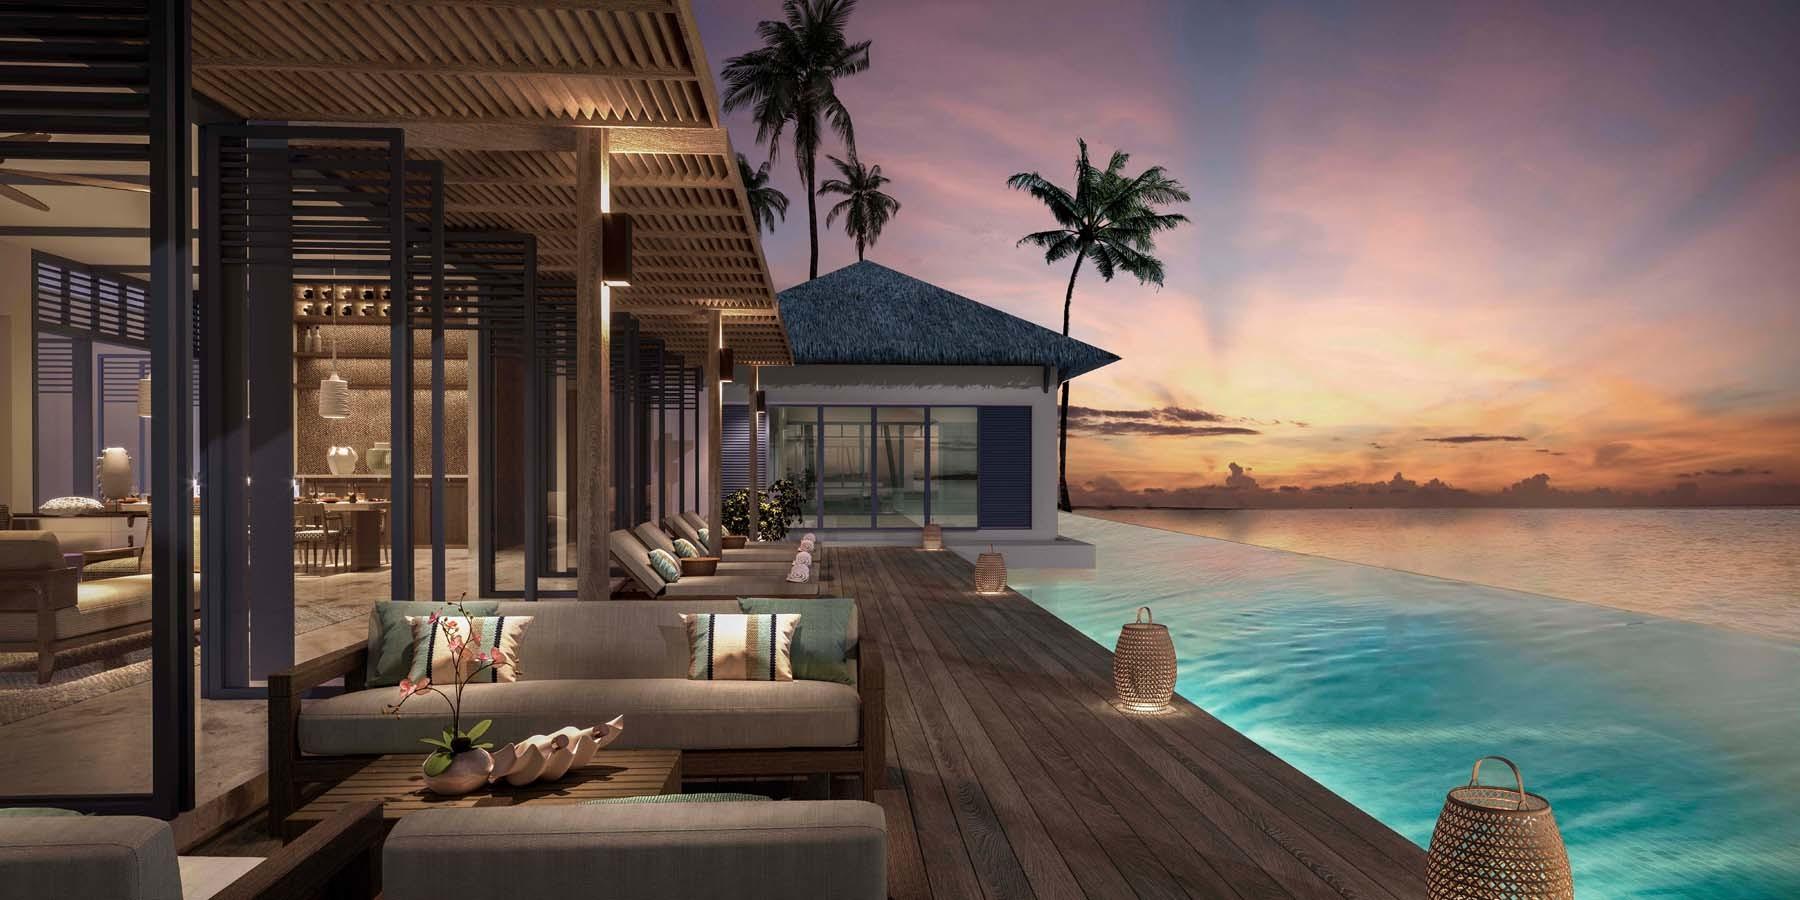 news-main-raffles-maldives-announces-key-new-roles.1616160939.jpg